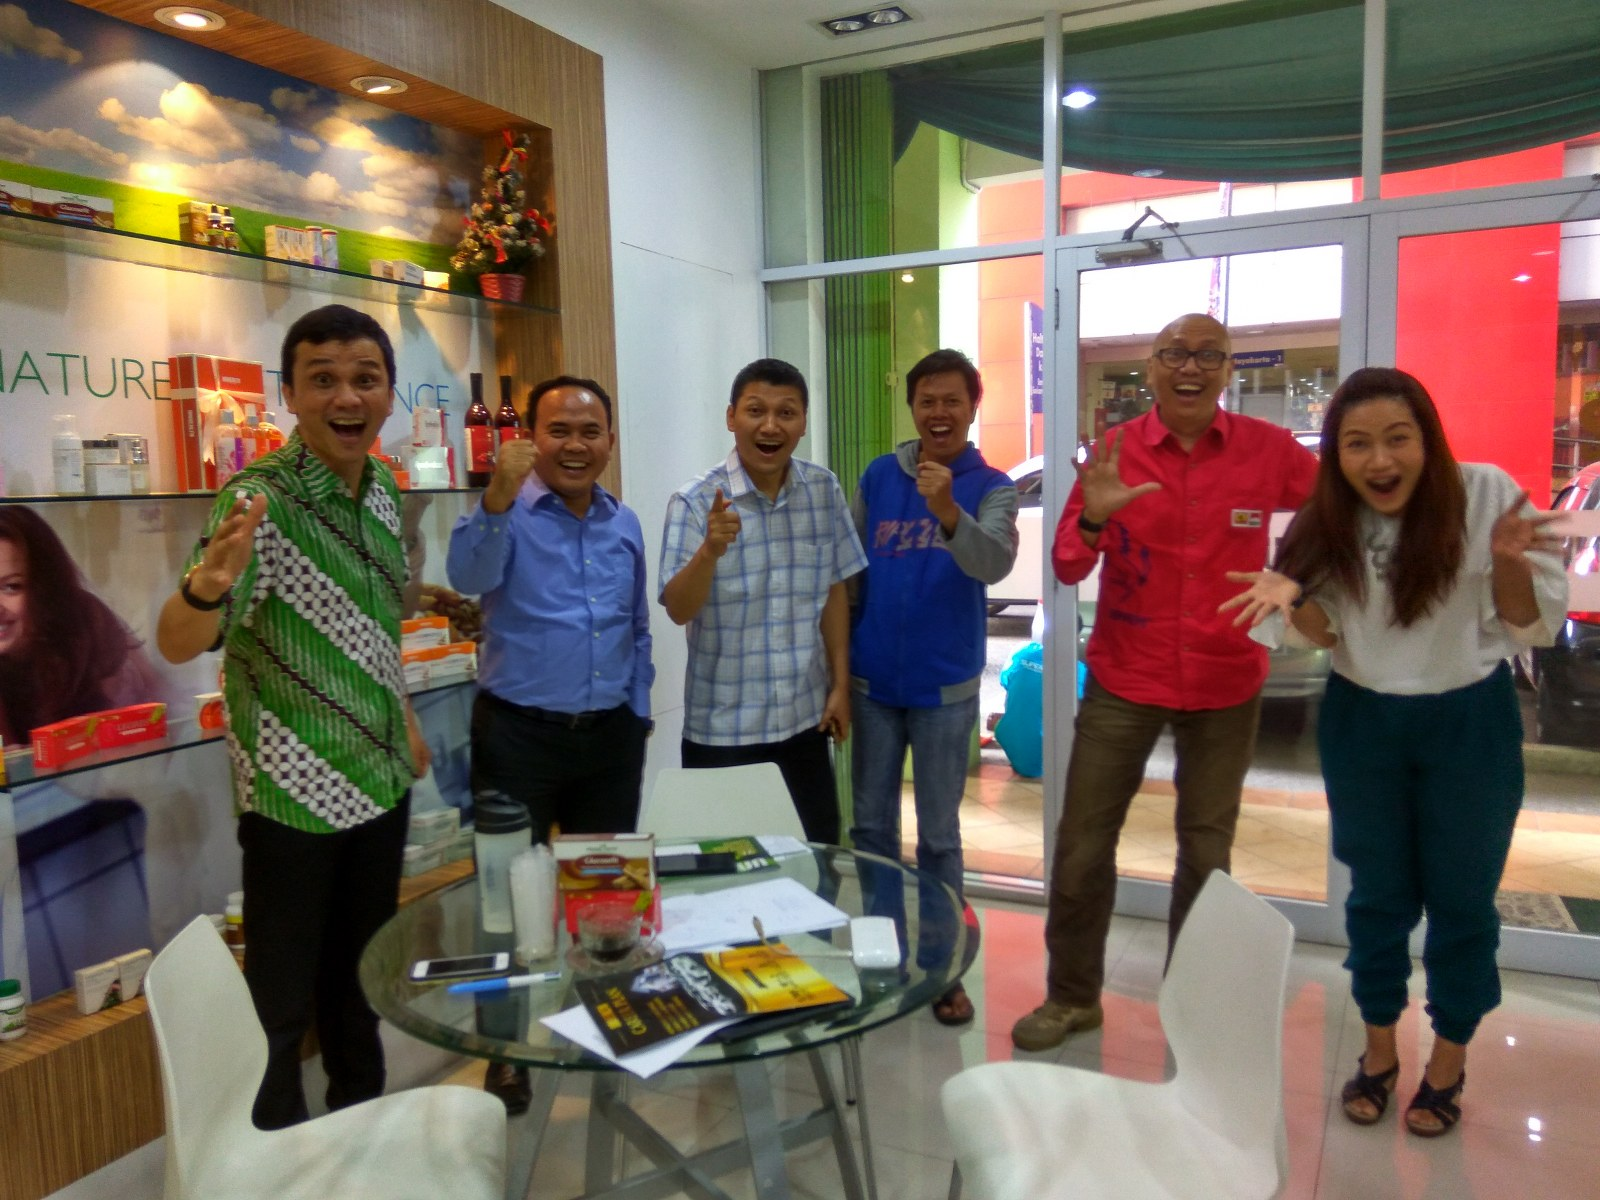 Magozai Jakarta selatan  087887428148 NOVI Cinere Pondok Indah Magozai toko agen distributor jual obat herbal Unihealth Soho Farmasi